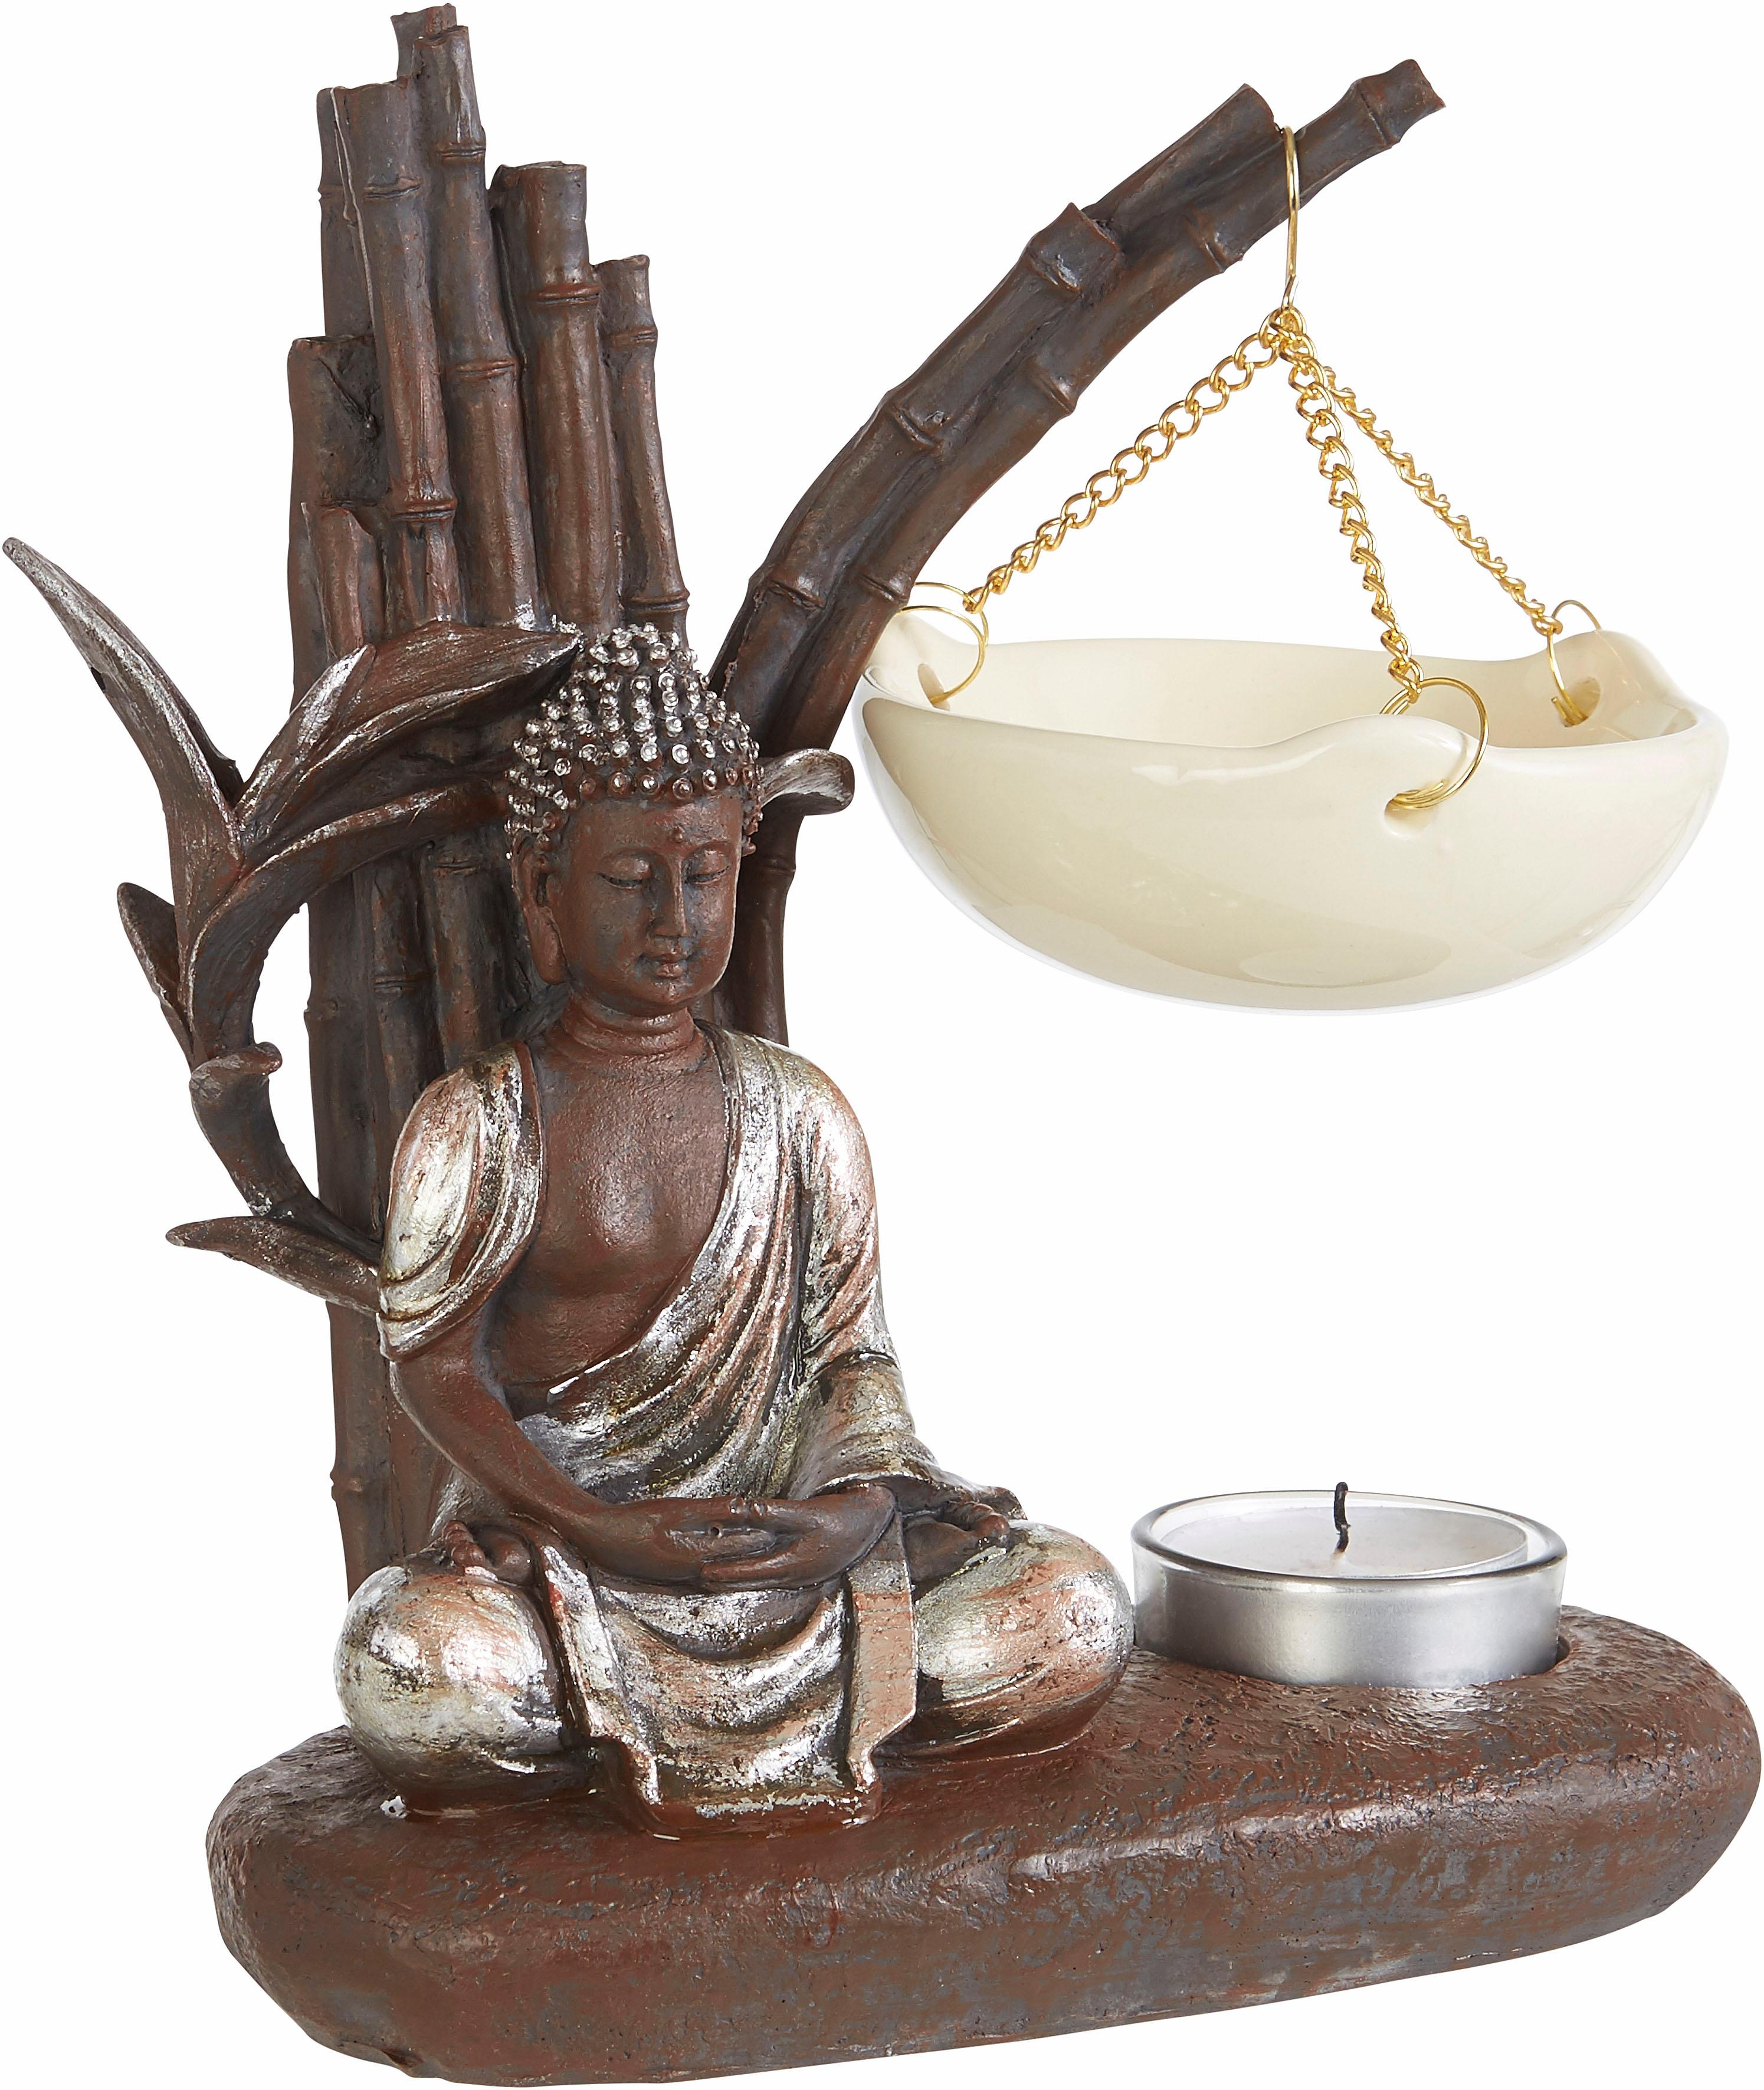 pajoma Duftlampe Buddha braun Kerzenhalter Kerzen Laternen Wohnaccessoires